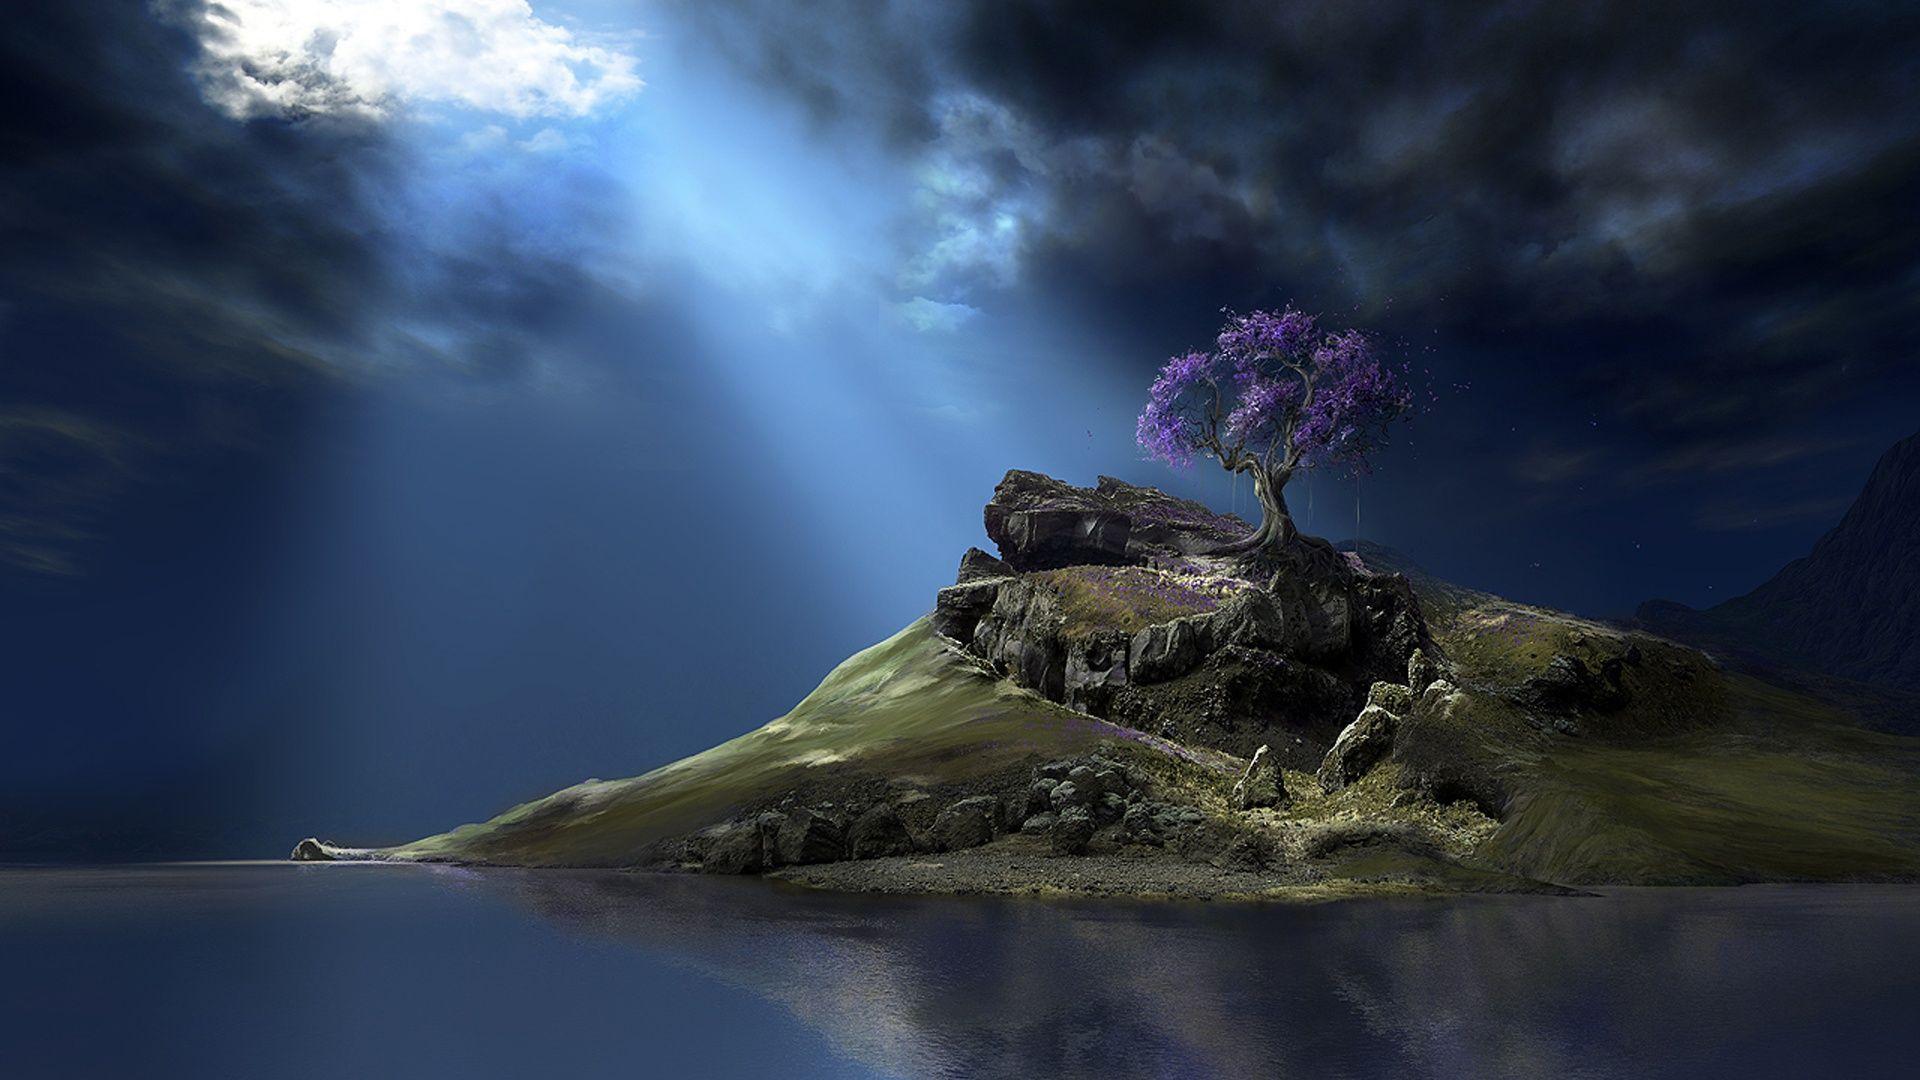 wallpaper | Digital Art Nature Wallpaper | Download | Back To ...